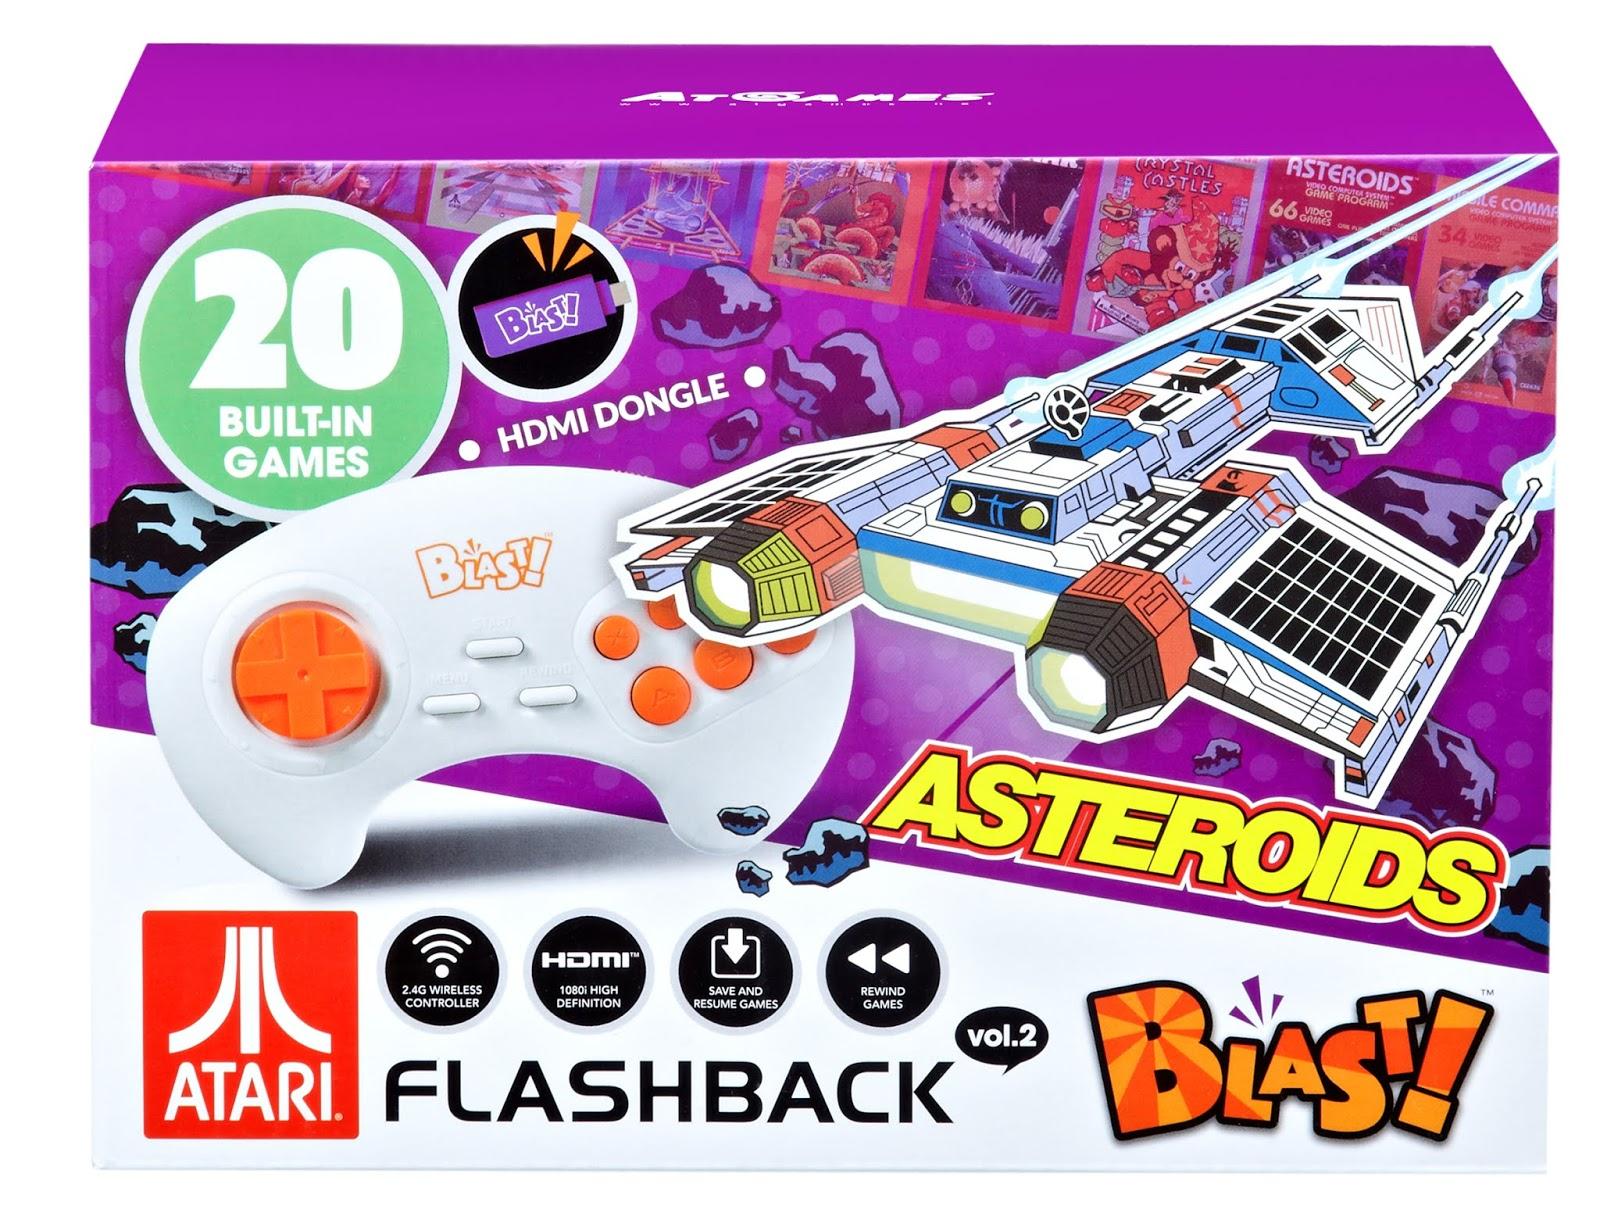 The Edge: AtGames Atari Flashback Blast! Vol. 2